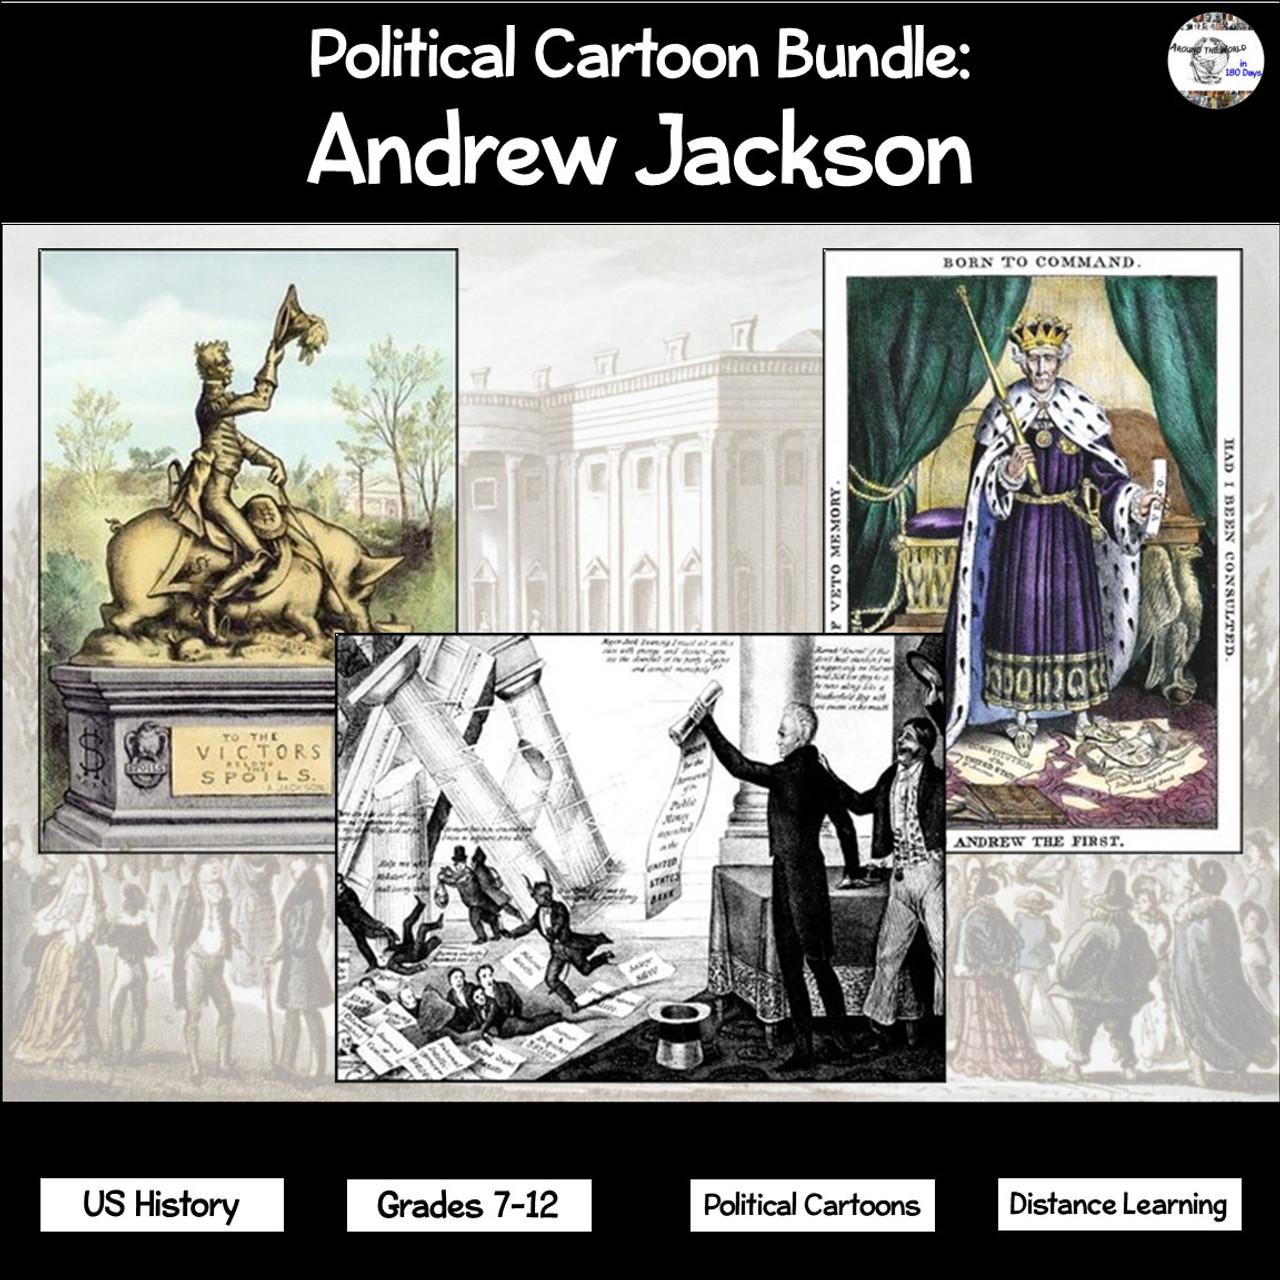 medium resolution of Political Cartoon Bundle: Andrew Jackson - Amped Up Learning